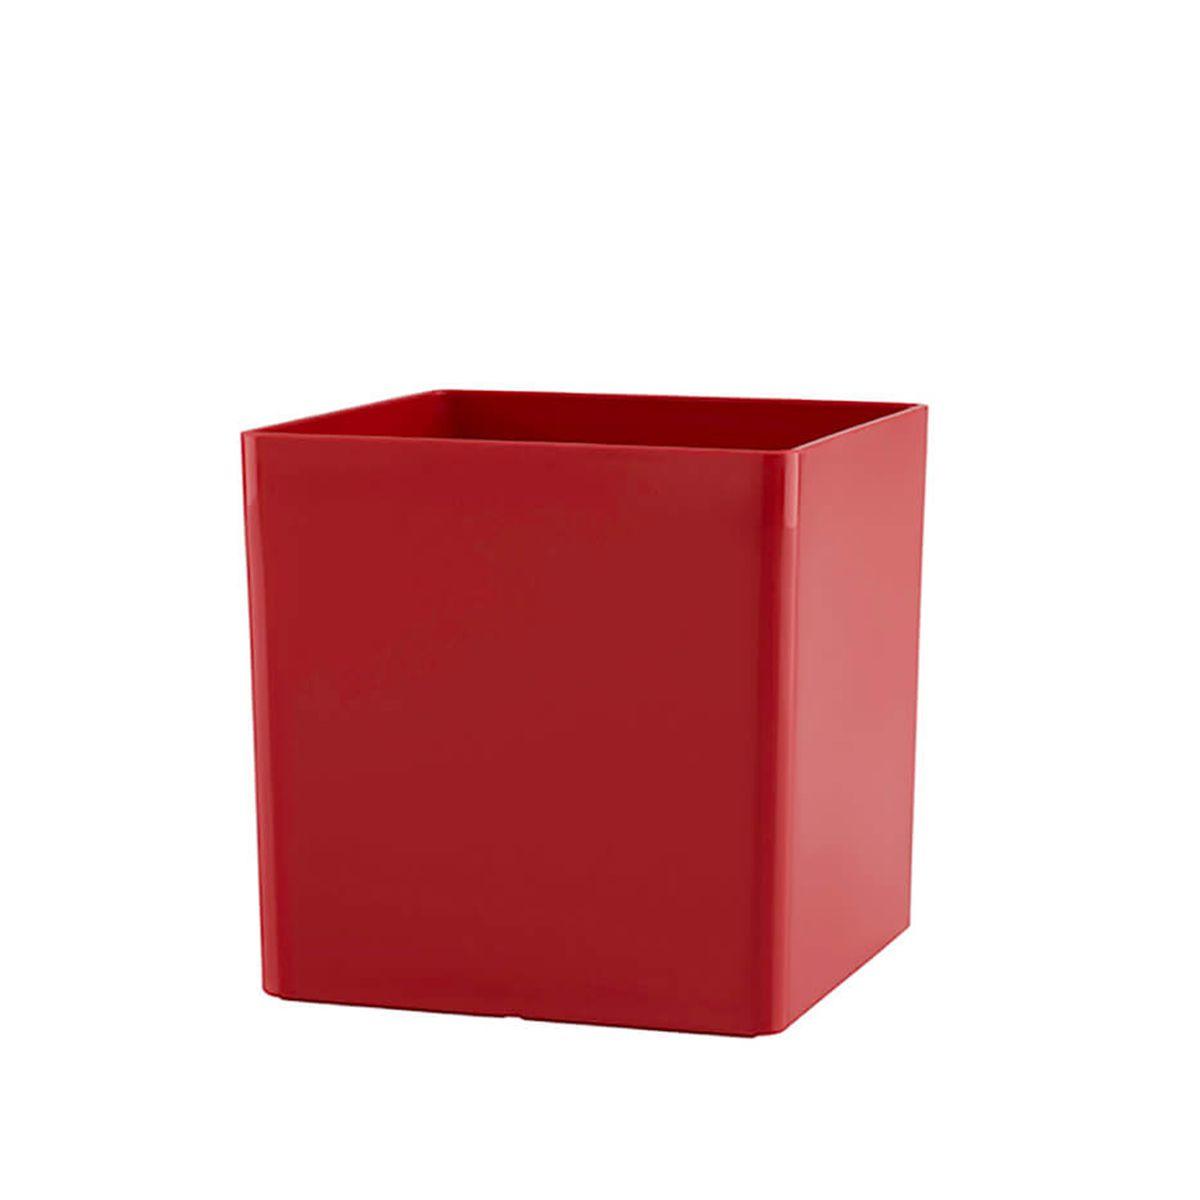 Vaso Cubo 14 x 14 cm Vermelho Vasart